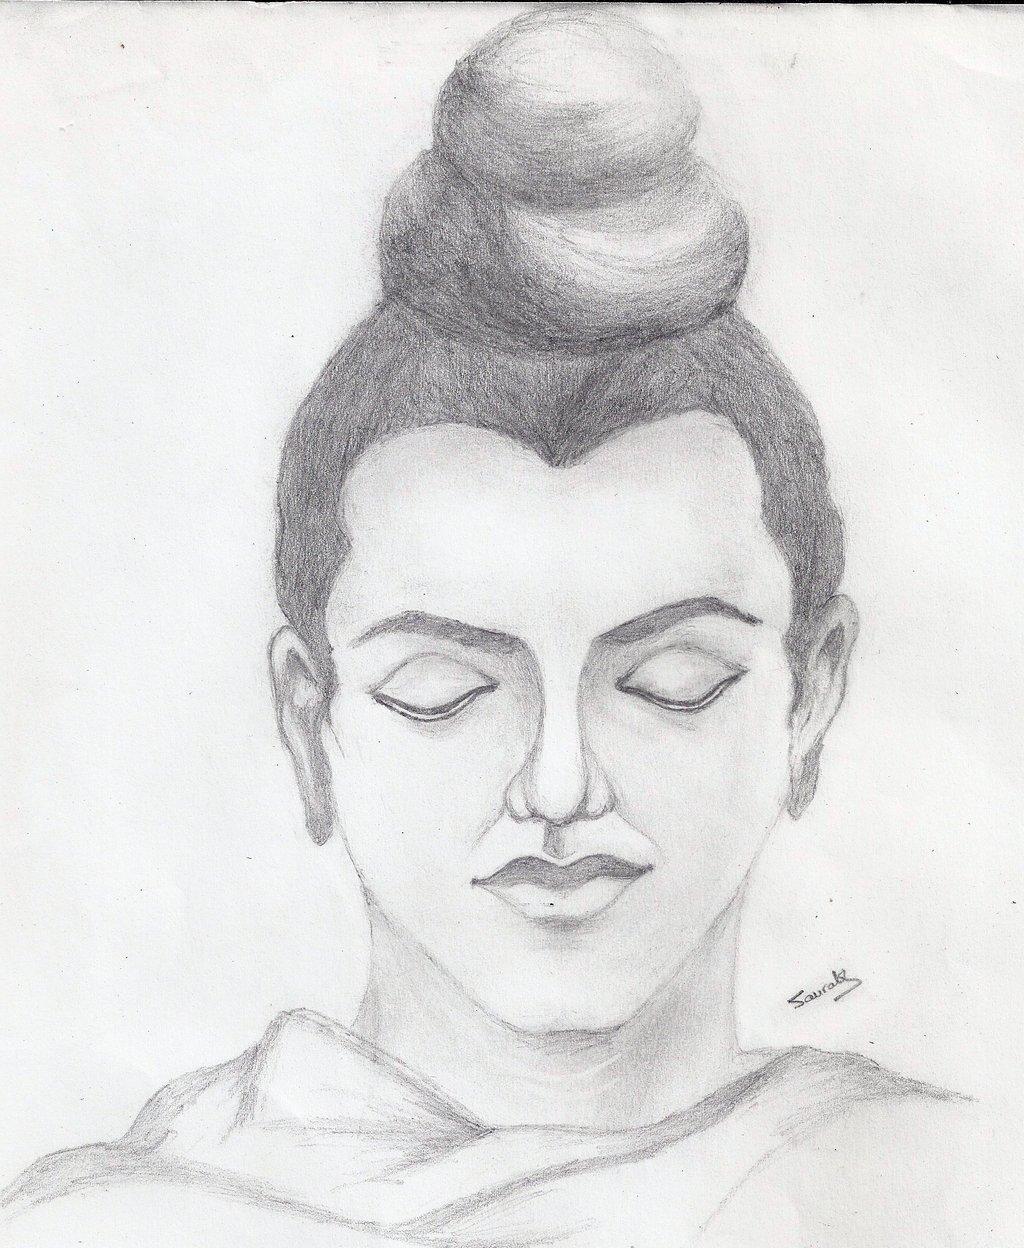 Gautama buddha drawing drawingsomeone com